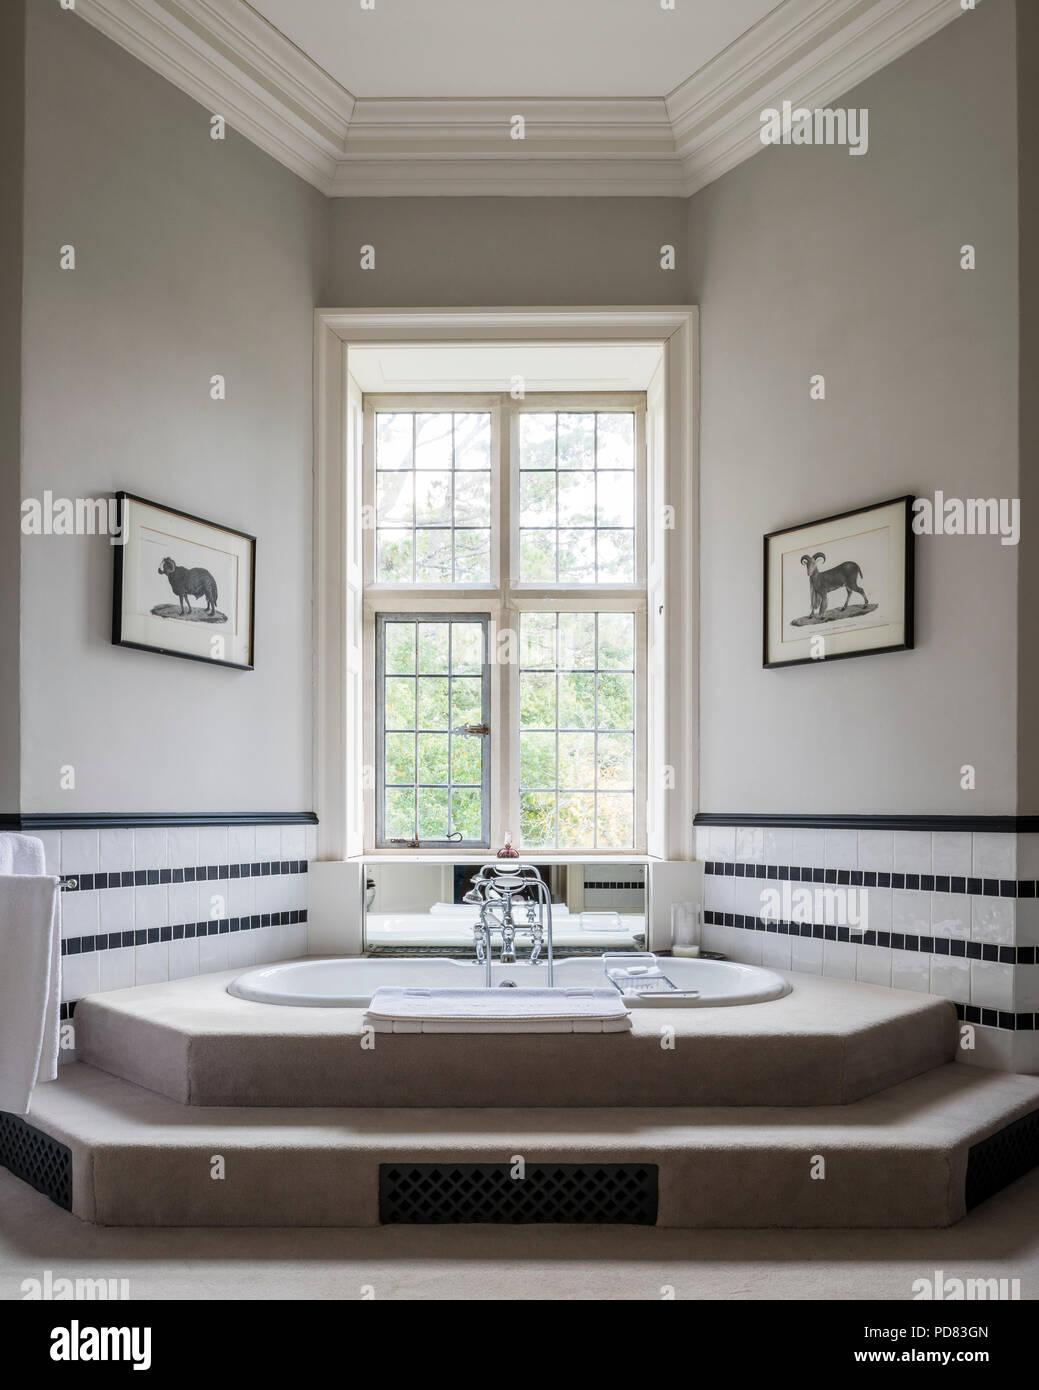 Sunken Bathtub Stock Photos & Sunken Bathtub Stock Images - Alamy